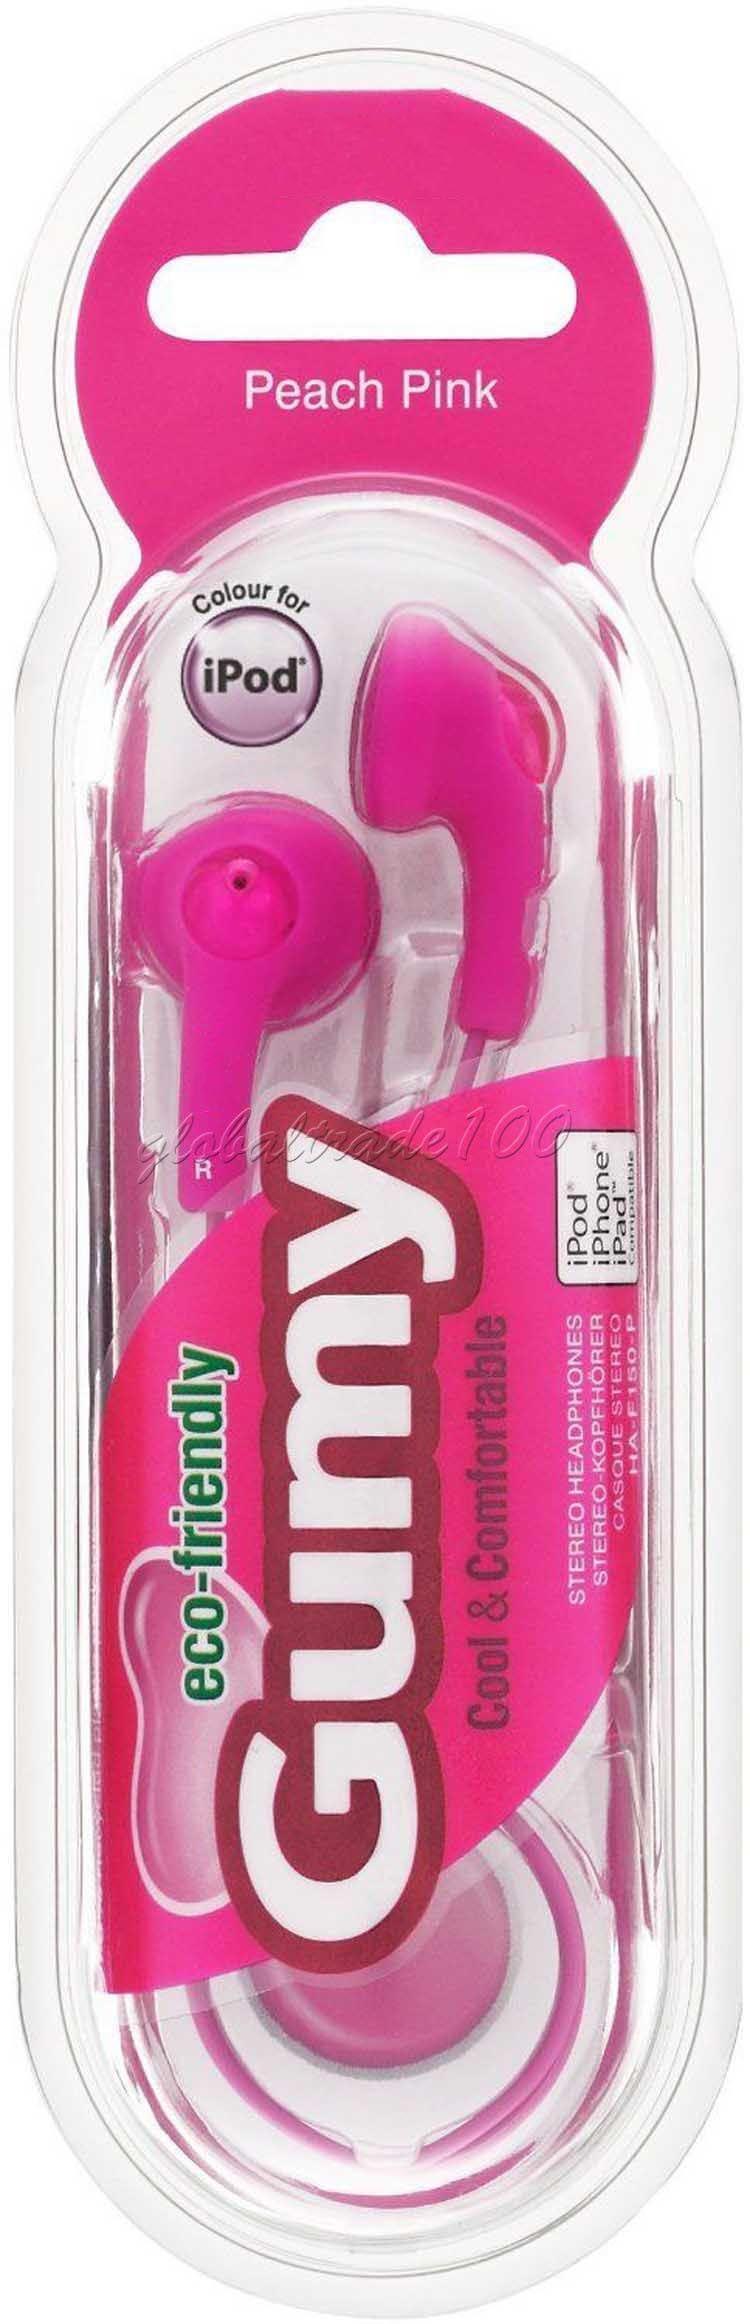 Gumy gummy kopfhörer ha f150 3,5 mm mp3 kopfhörer kopfhörer kein mic bunt für iphone ipad ipod samsung htc